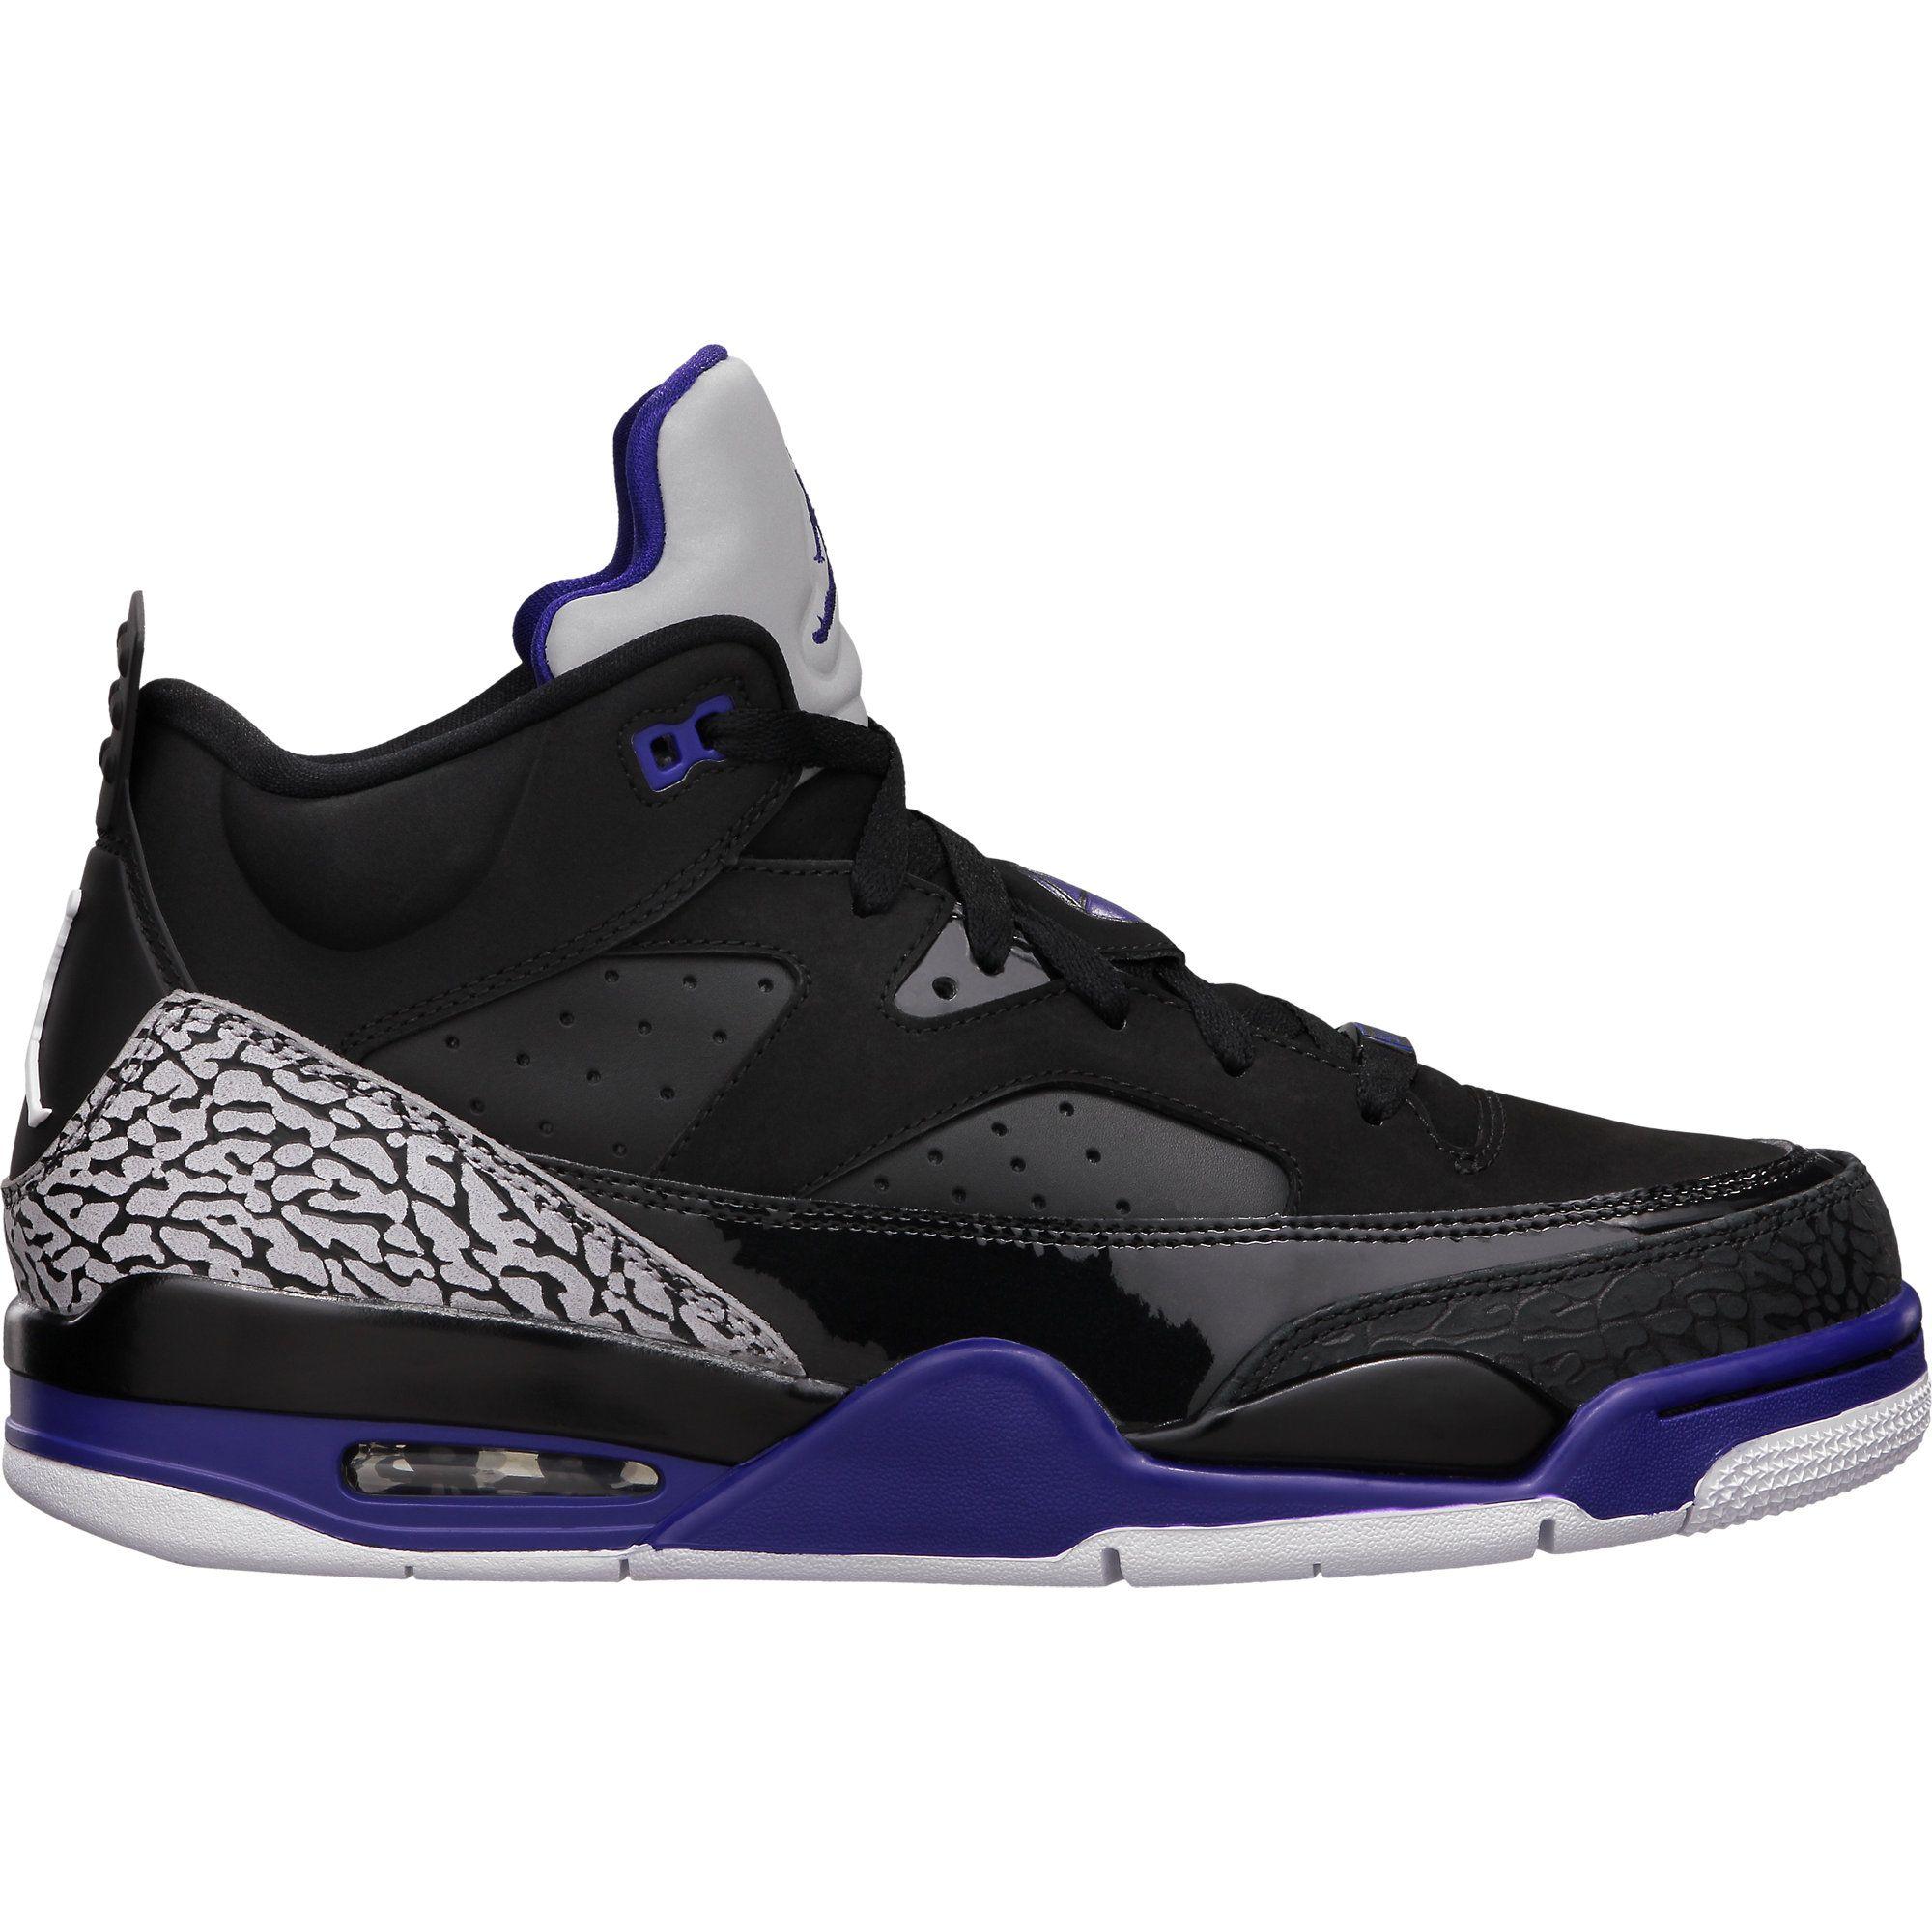 Jordan basketball shoes